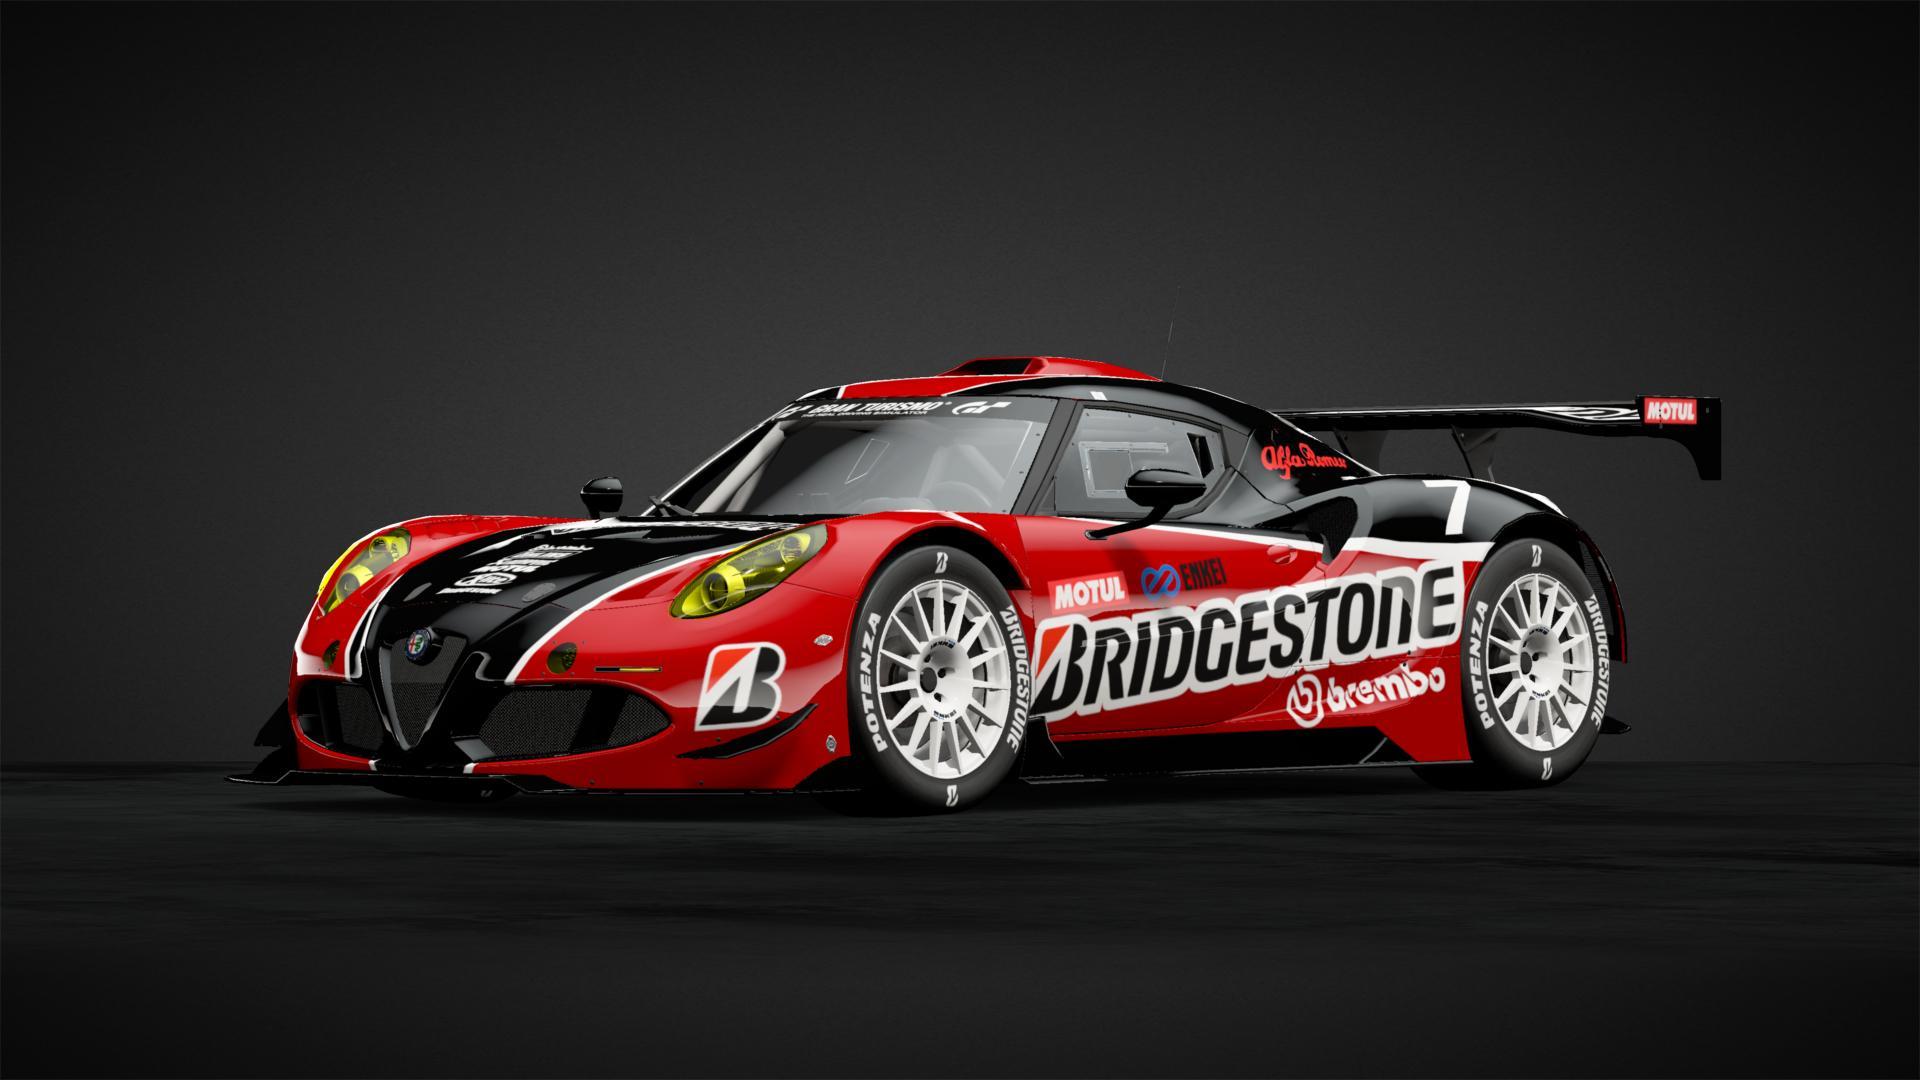 Bridgestone Alfa Romeo 4c Gt3 Car Livery By Exmxols3n Community Gran Turismo Sport